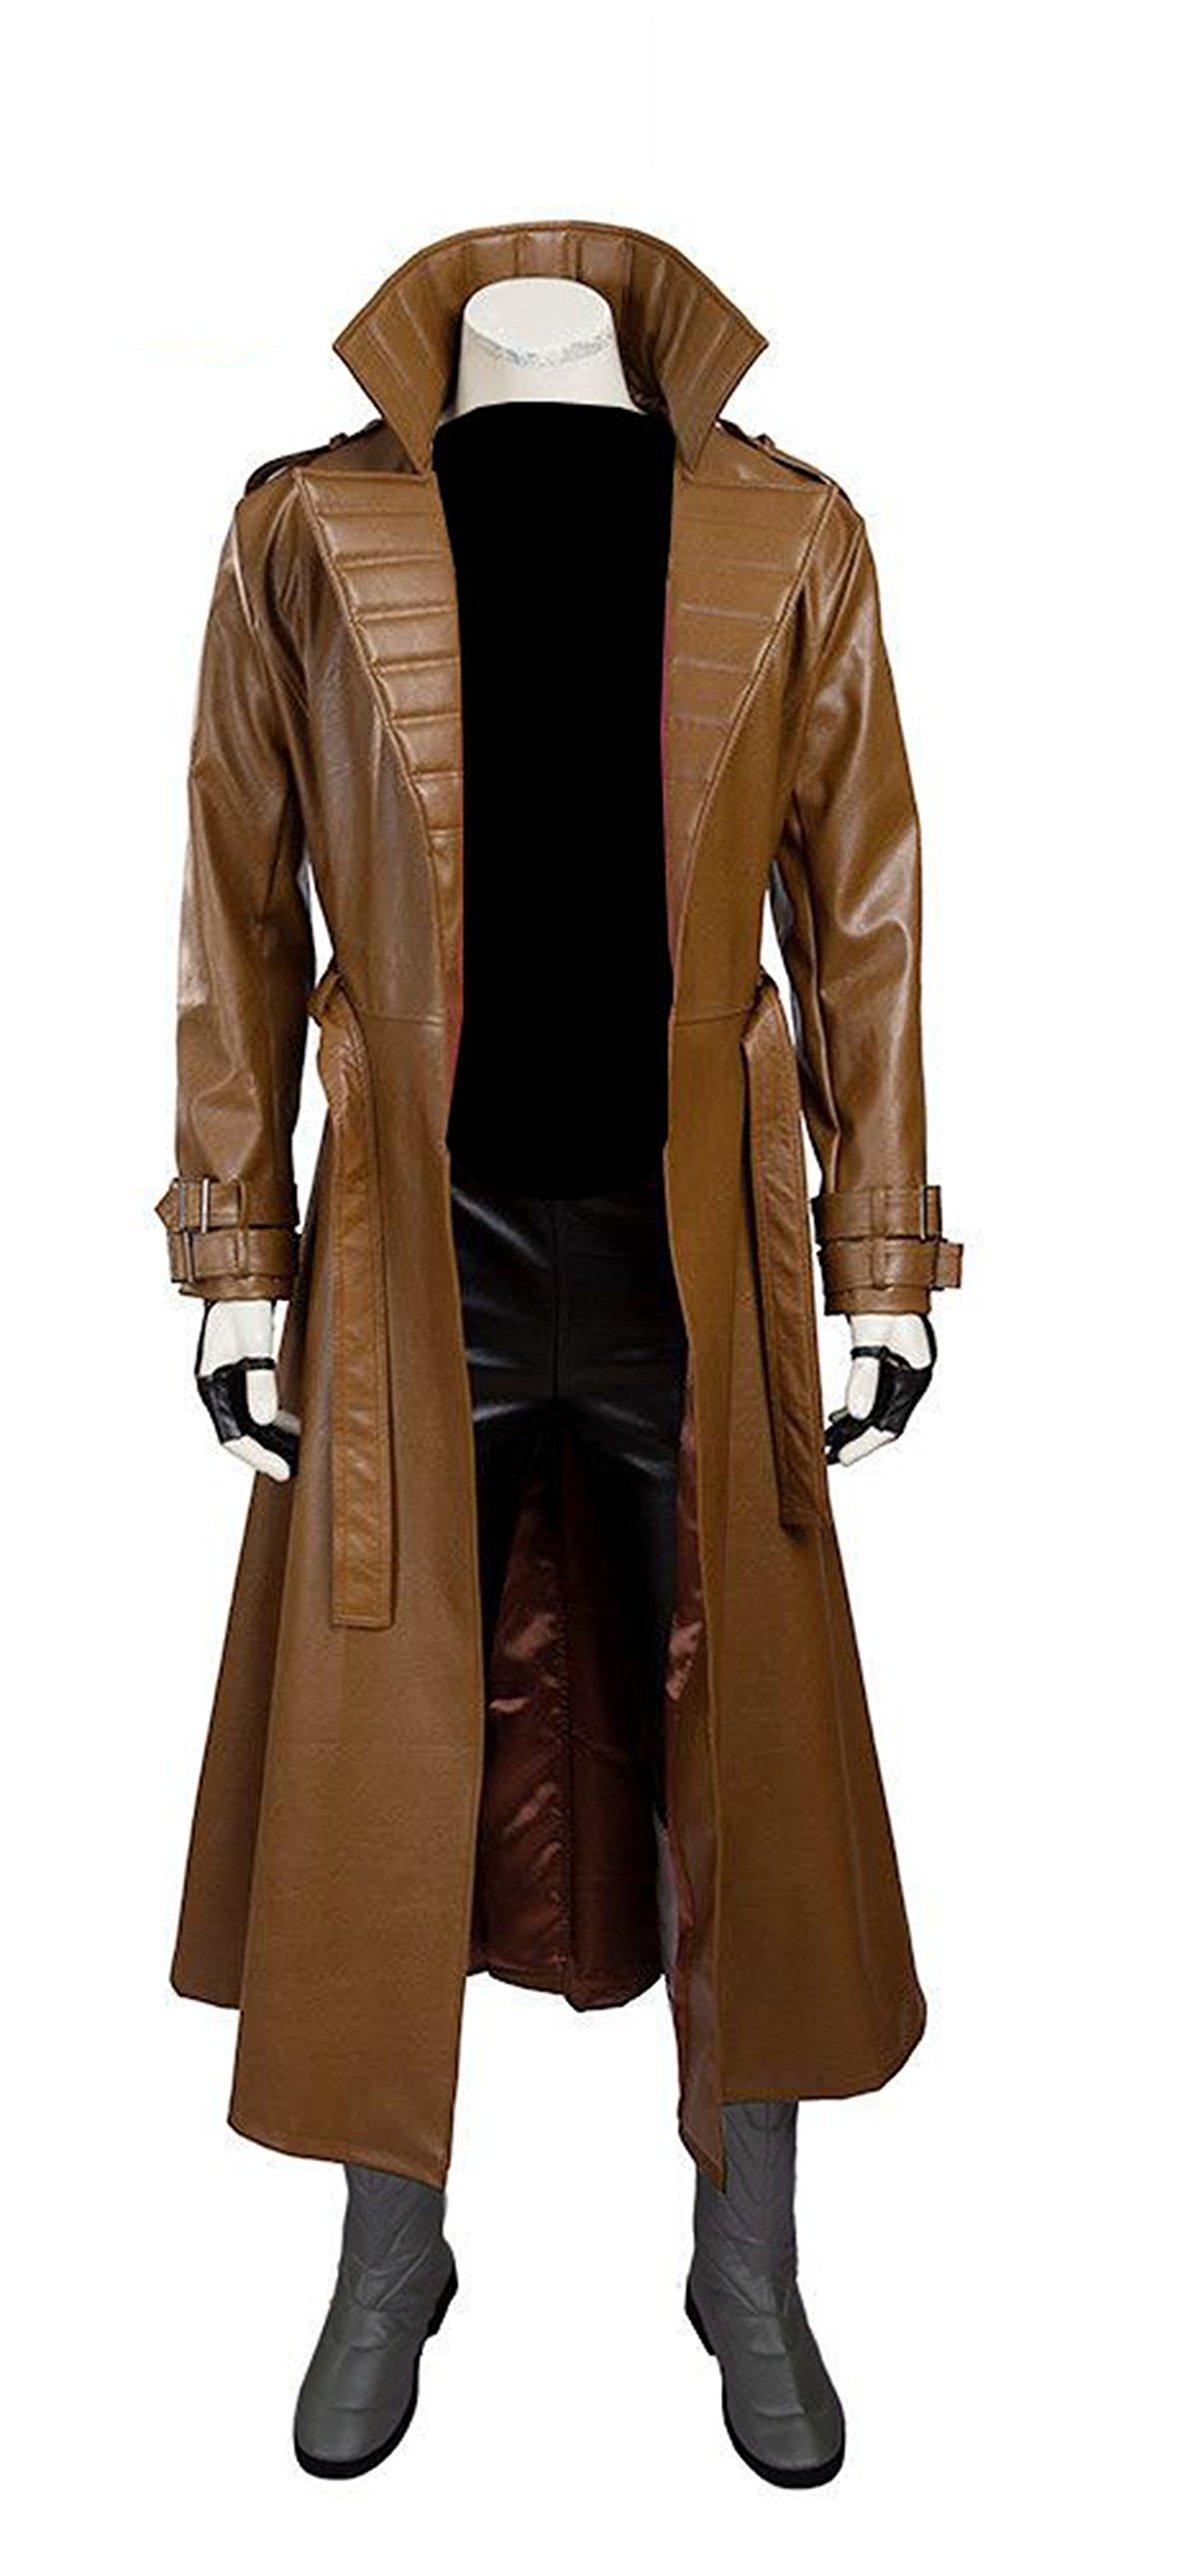 Gambit Channing Tatum Leather Brown Trench Coat | gambit coat